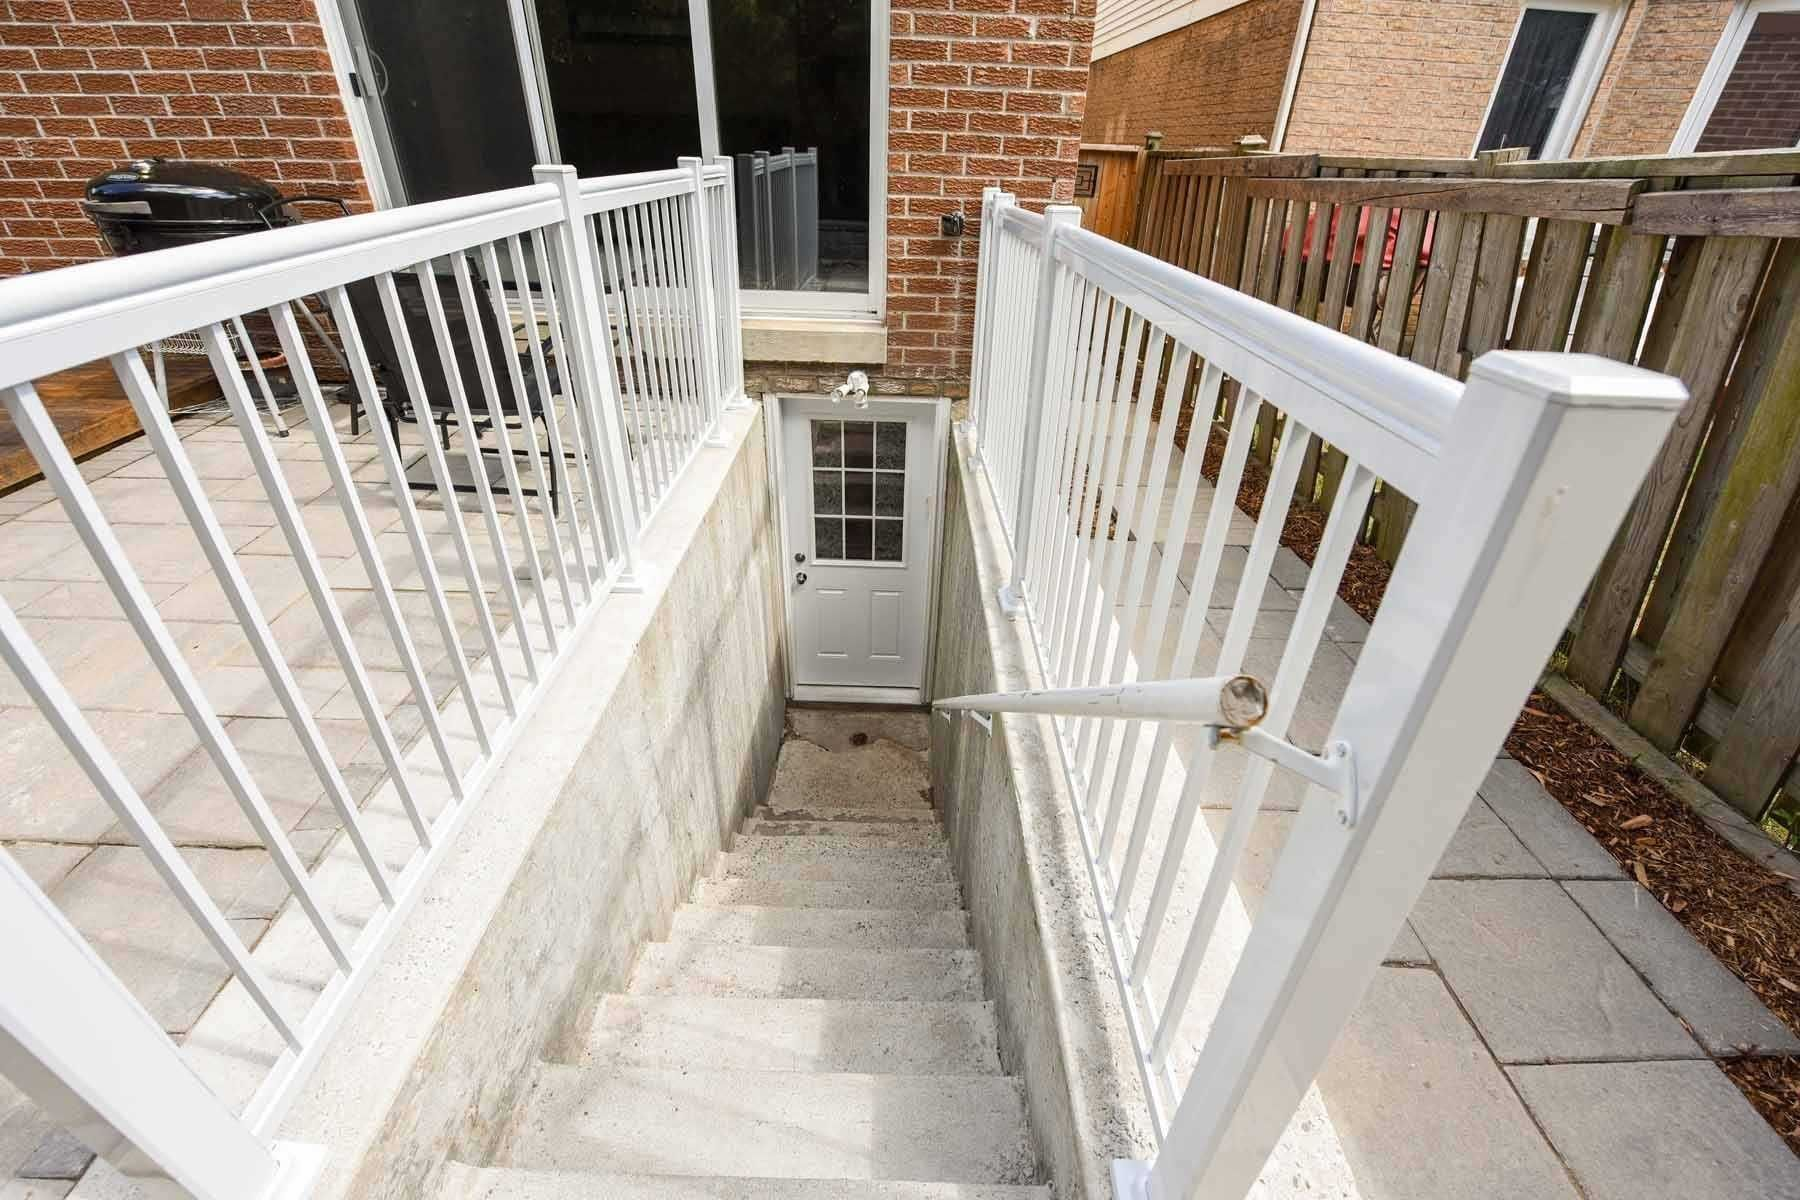 Photo 11: Photos: 20 Hallen Road in Brampton: Fletcher's West House (Apartment) for lease : MLS®# W5074220